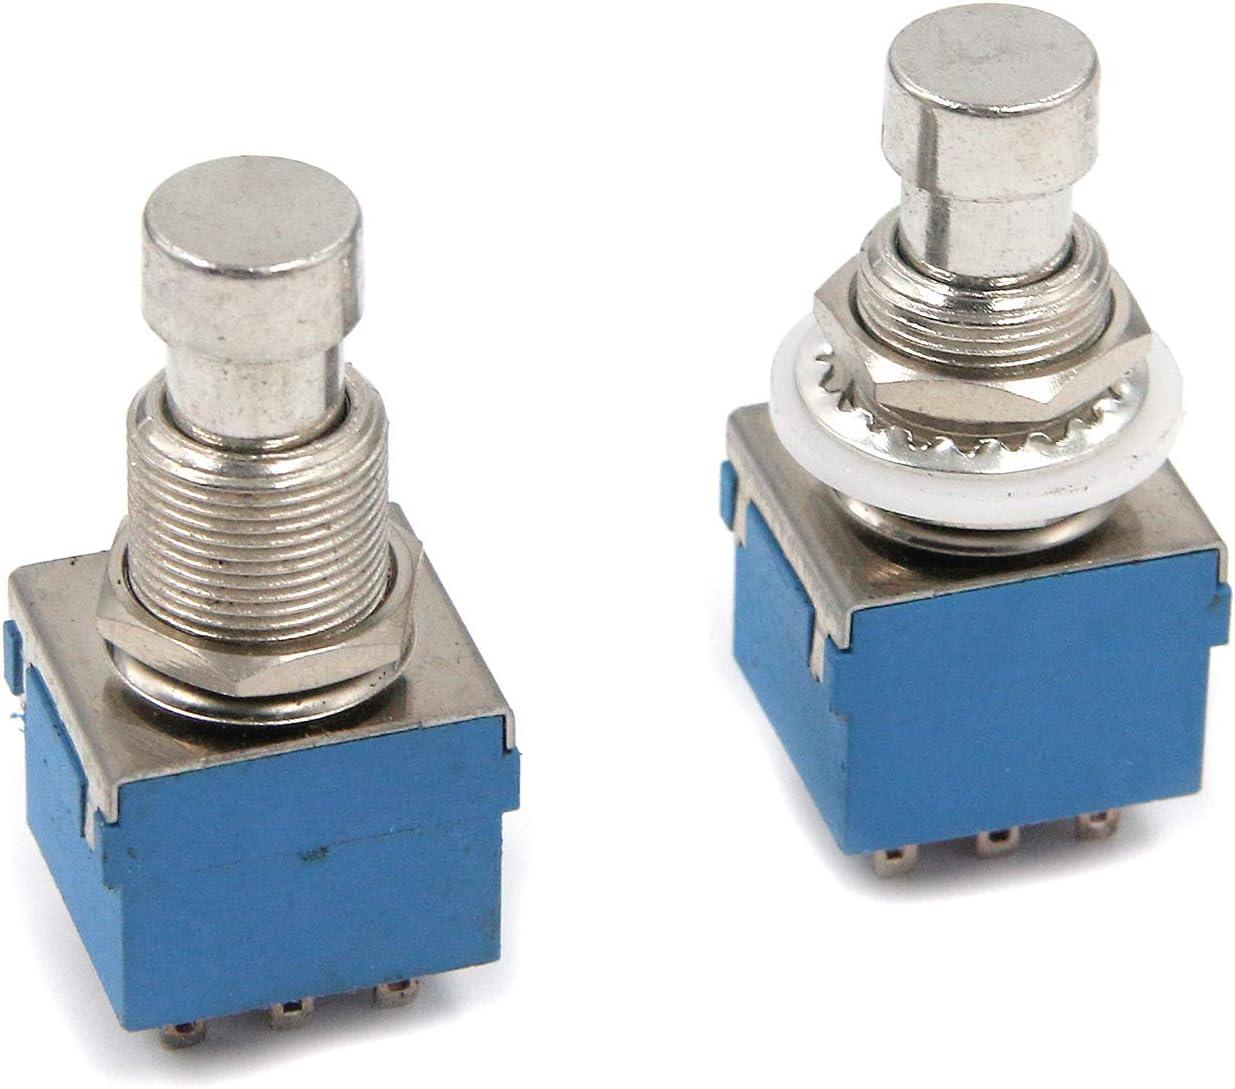 Geesatis 2 Pcs Guitar Effect Max 72% OFF Pedal Box Pins Foot Switch Overseas parallel import regular item Stomp 9